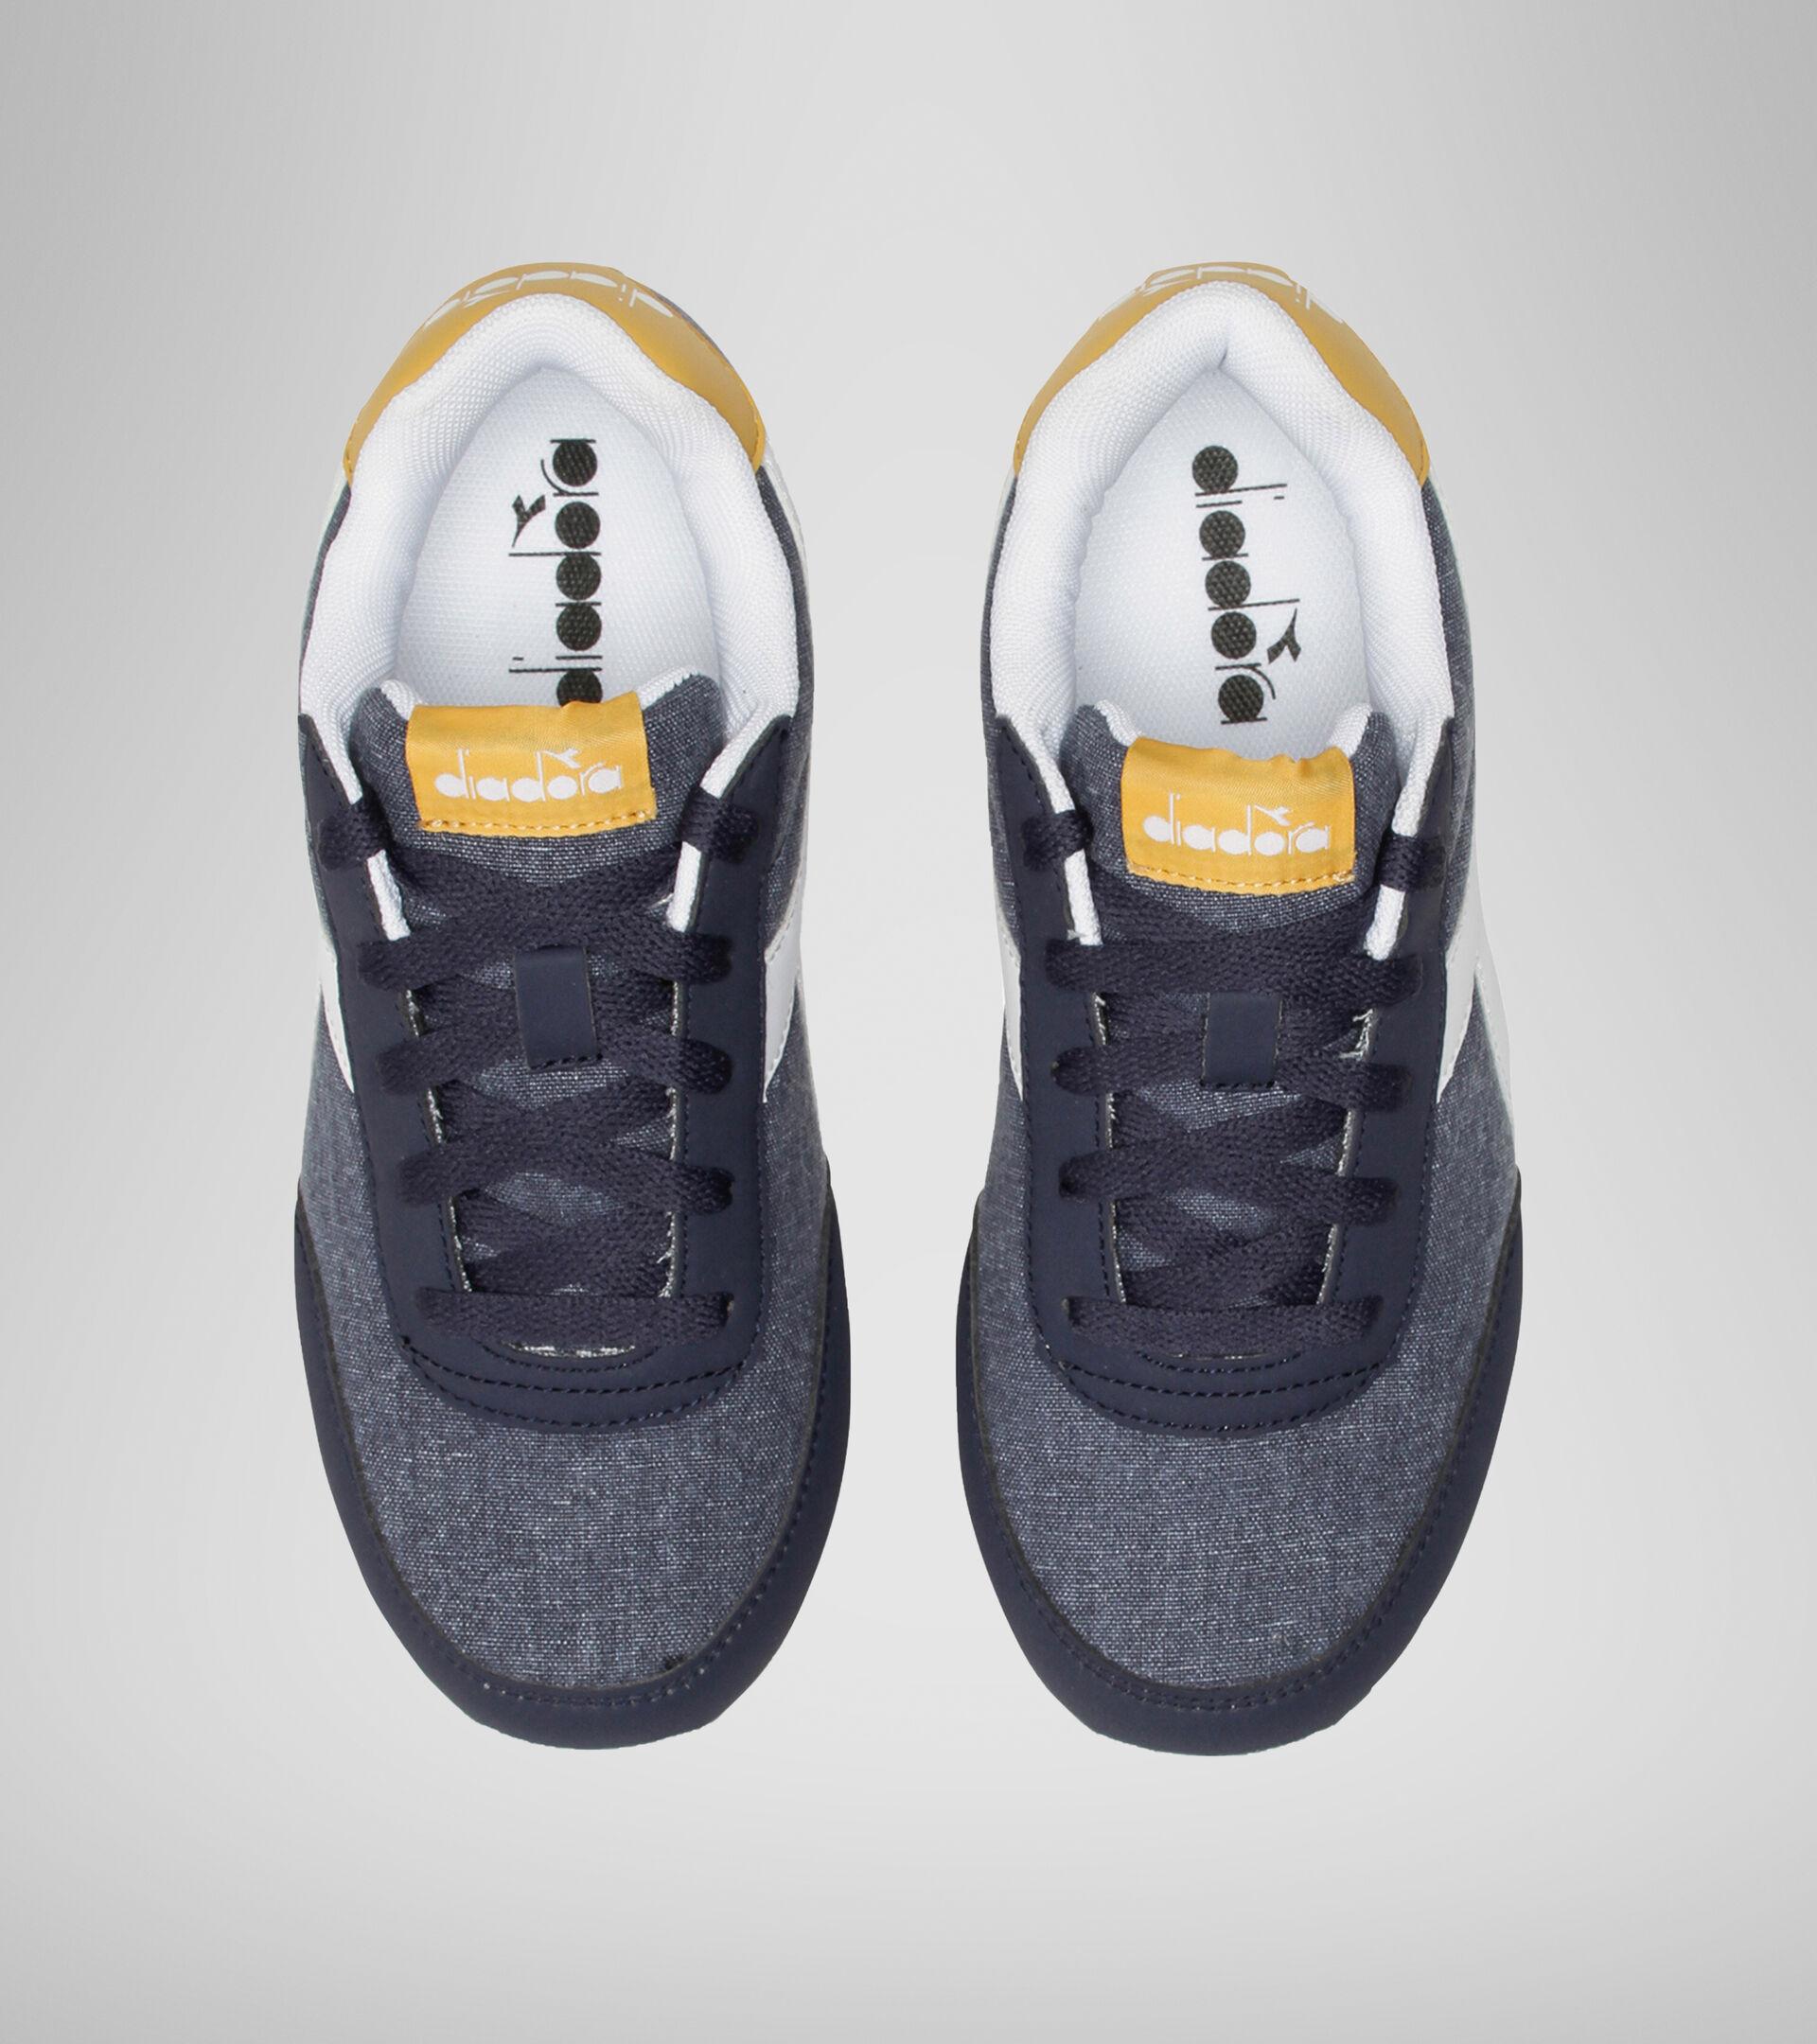 Chaussures de sport - Jeunes 8-16 ans JOG LIGHT GS NOIR IRIS/ABRICOT DORE - Diadora